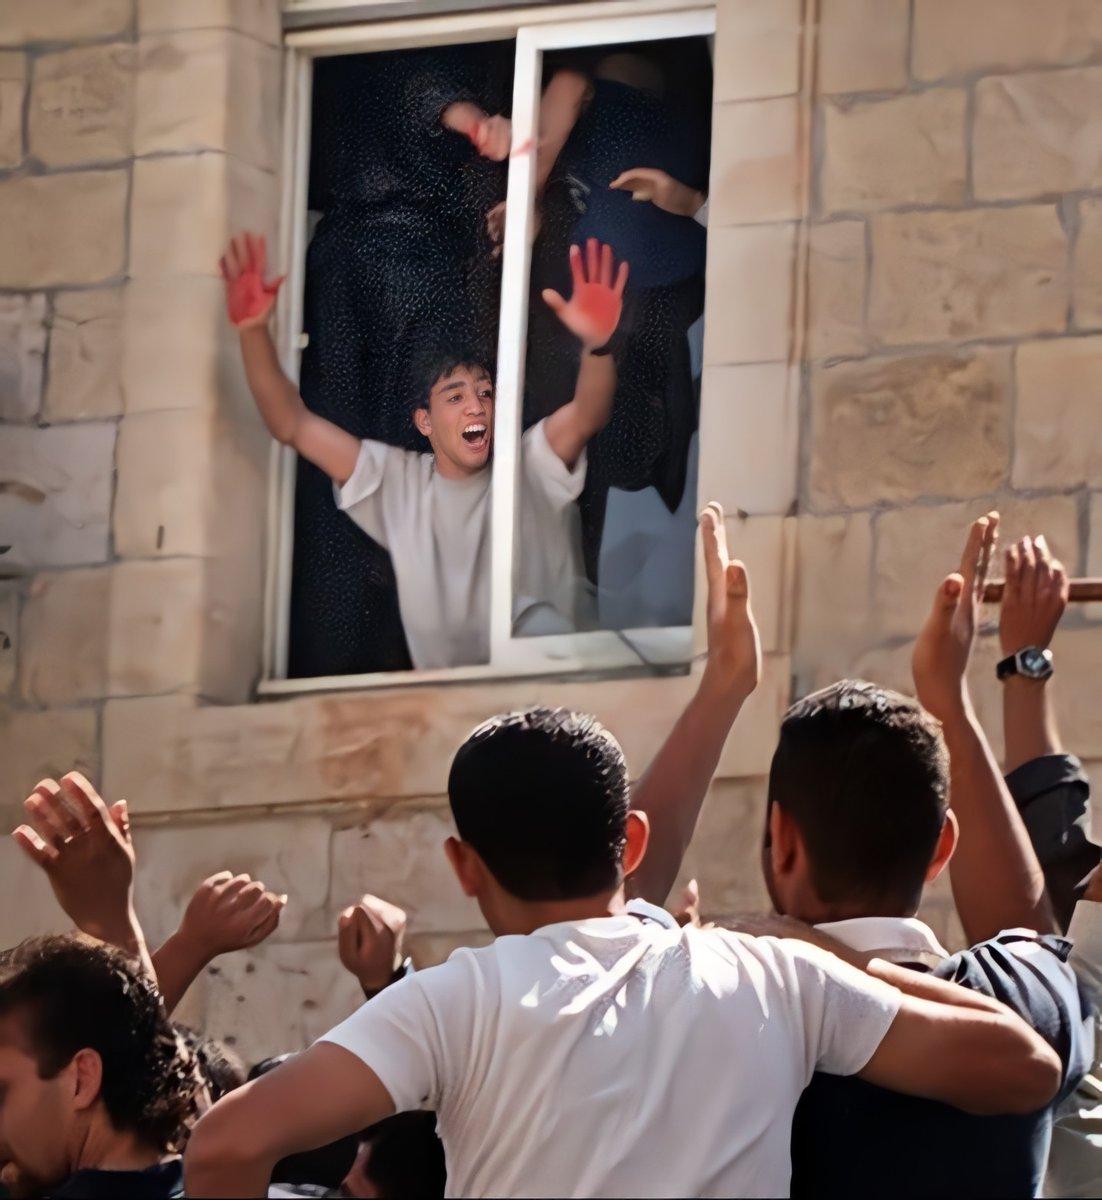 lynchage Ramallah 2.jpg